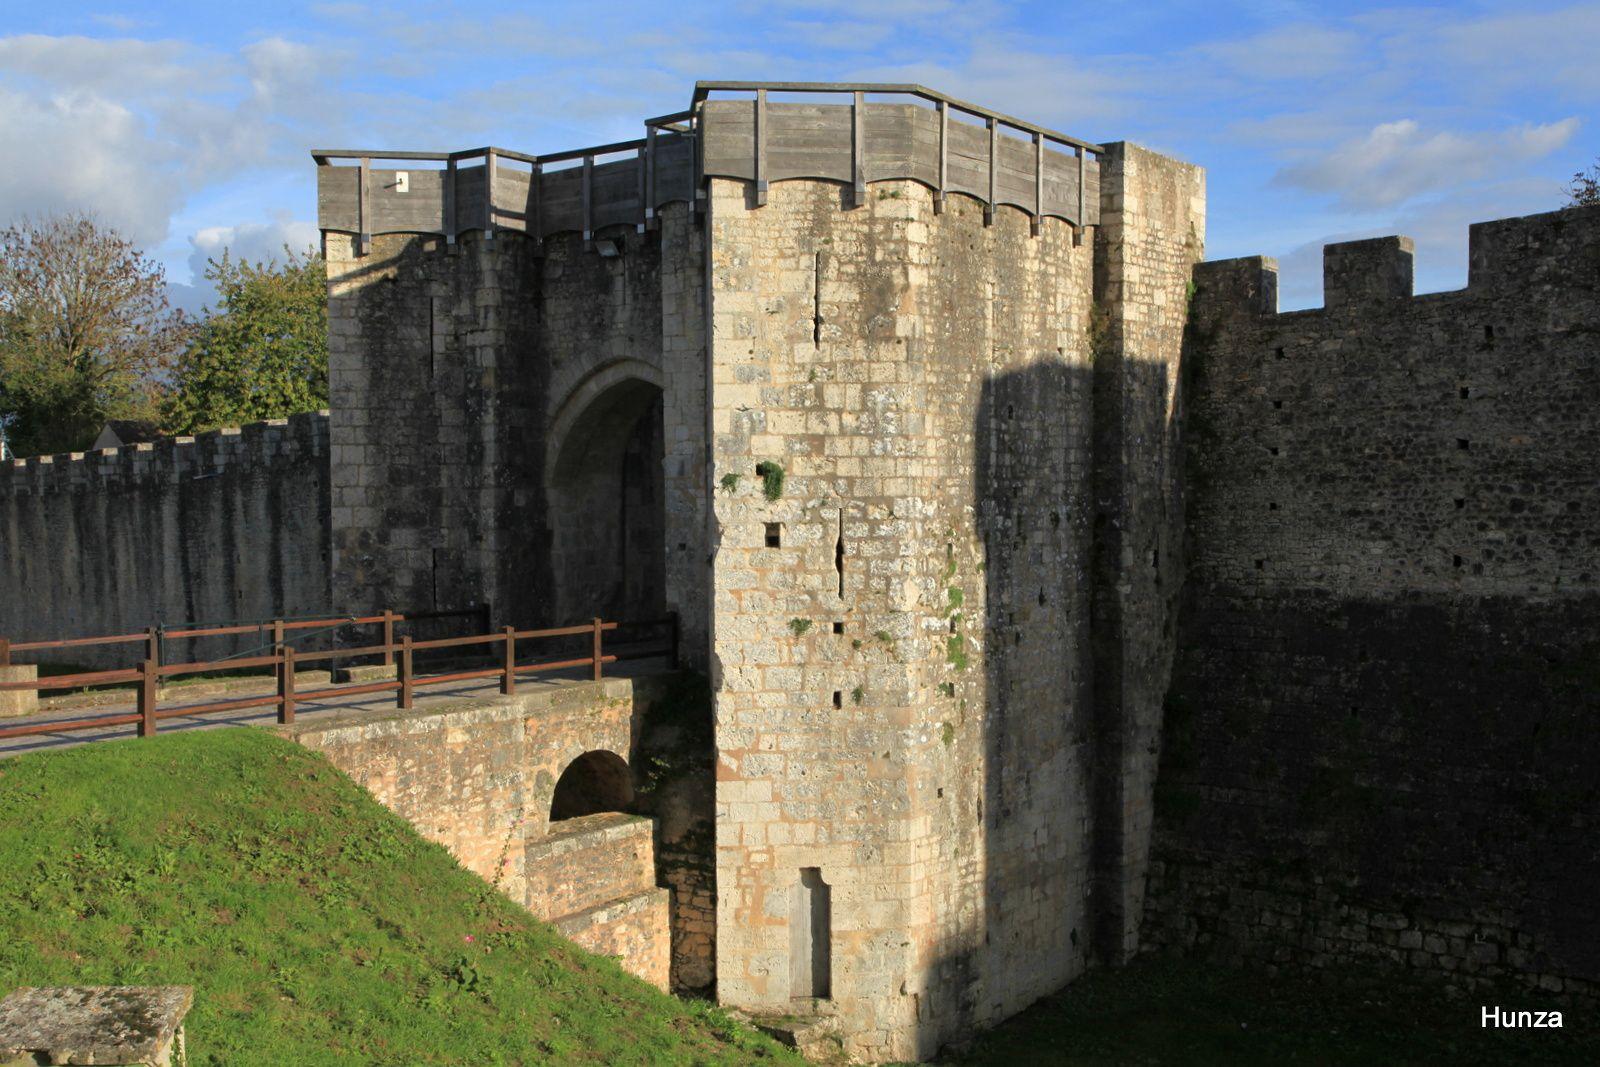 Porte de Jouy